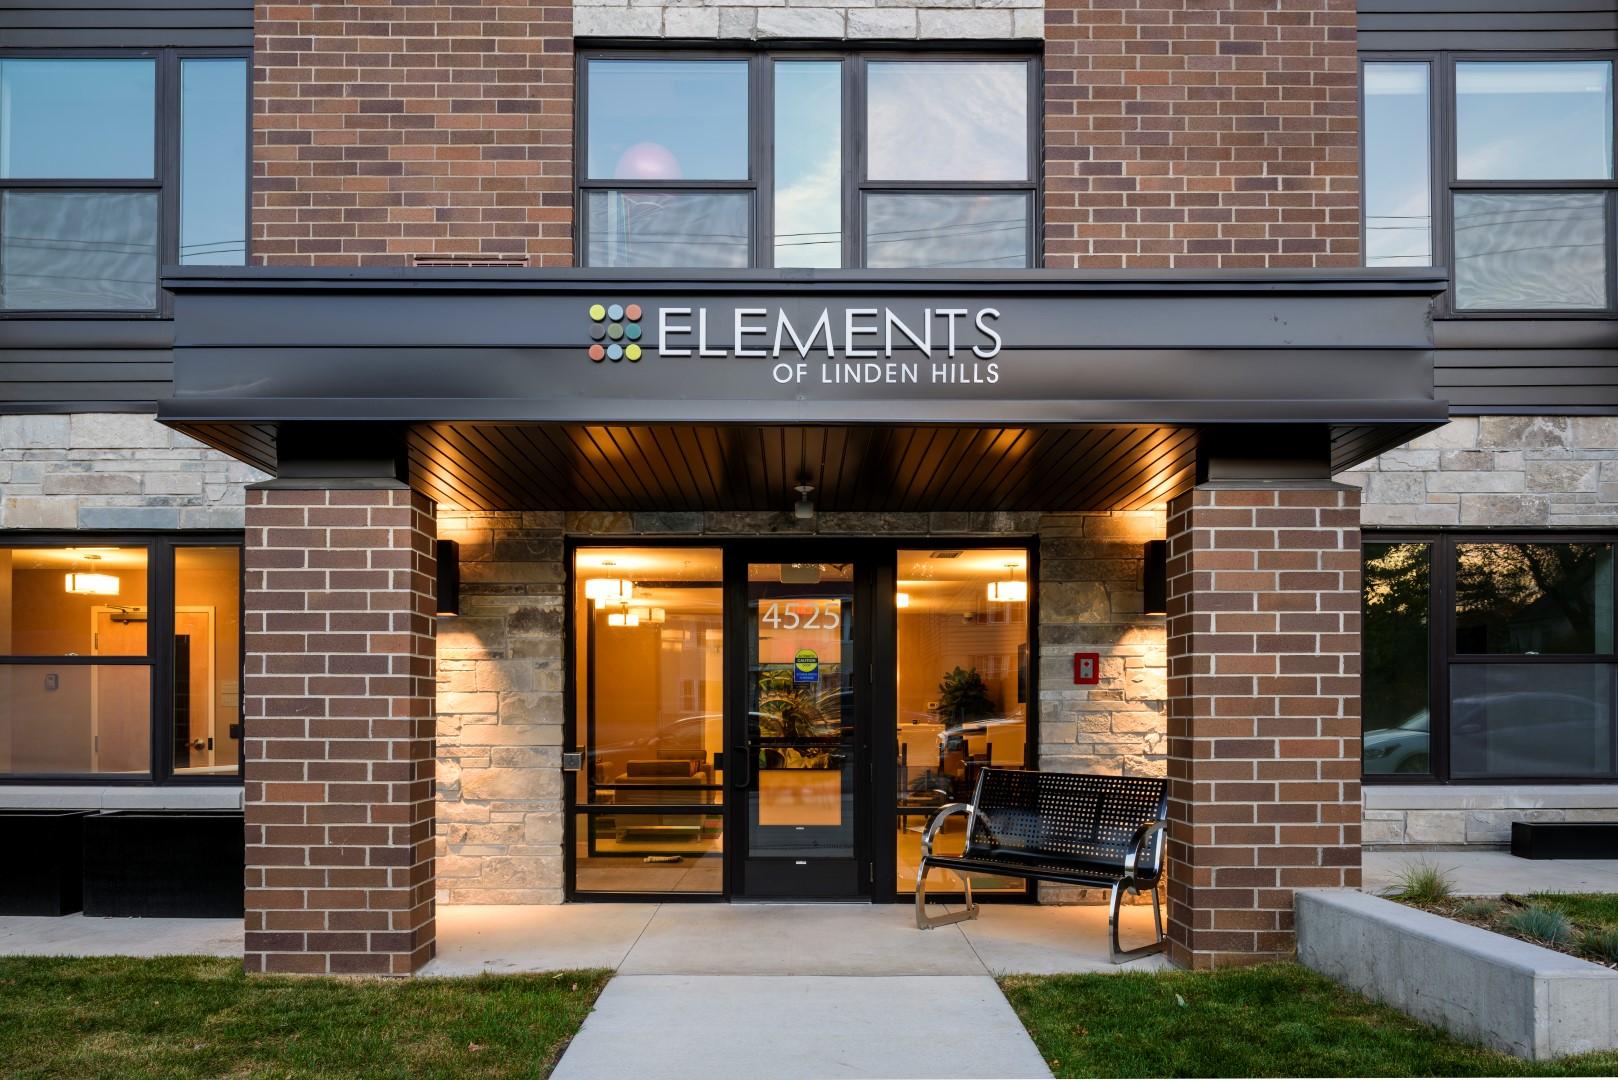 Elements-of-Linden-Hills-Apartment-Minneapolis-Minnesota-Exterior3 (Large).jpg